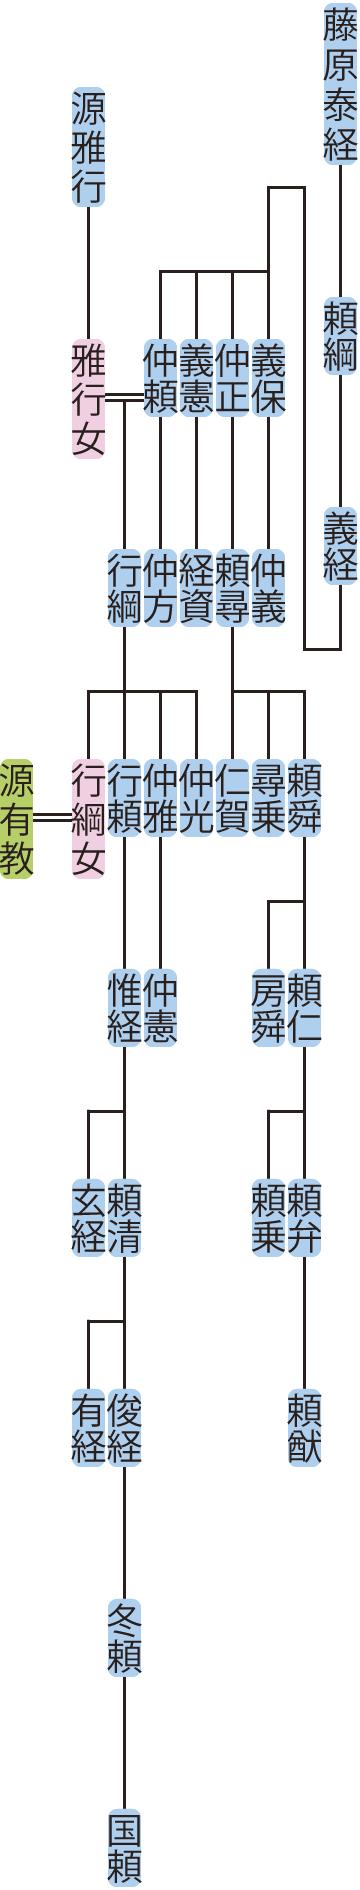 藤原義経の系図